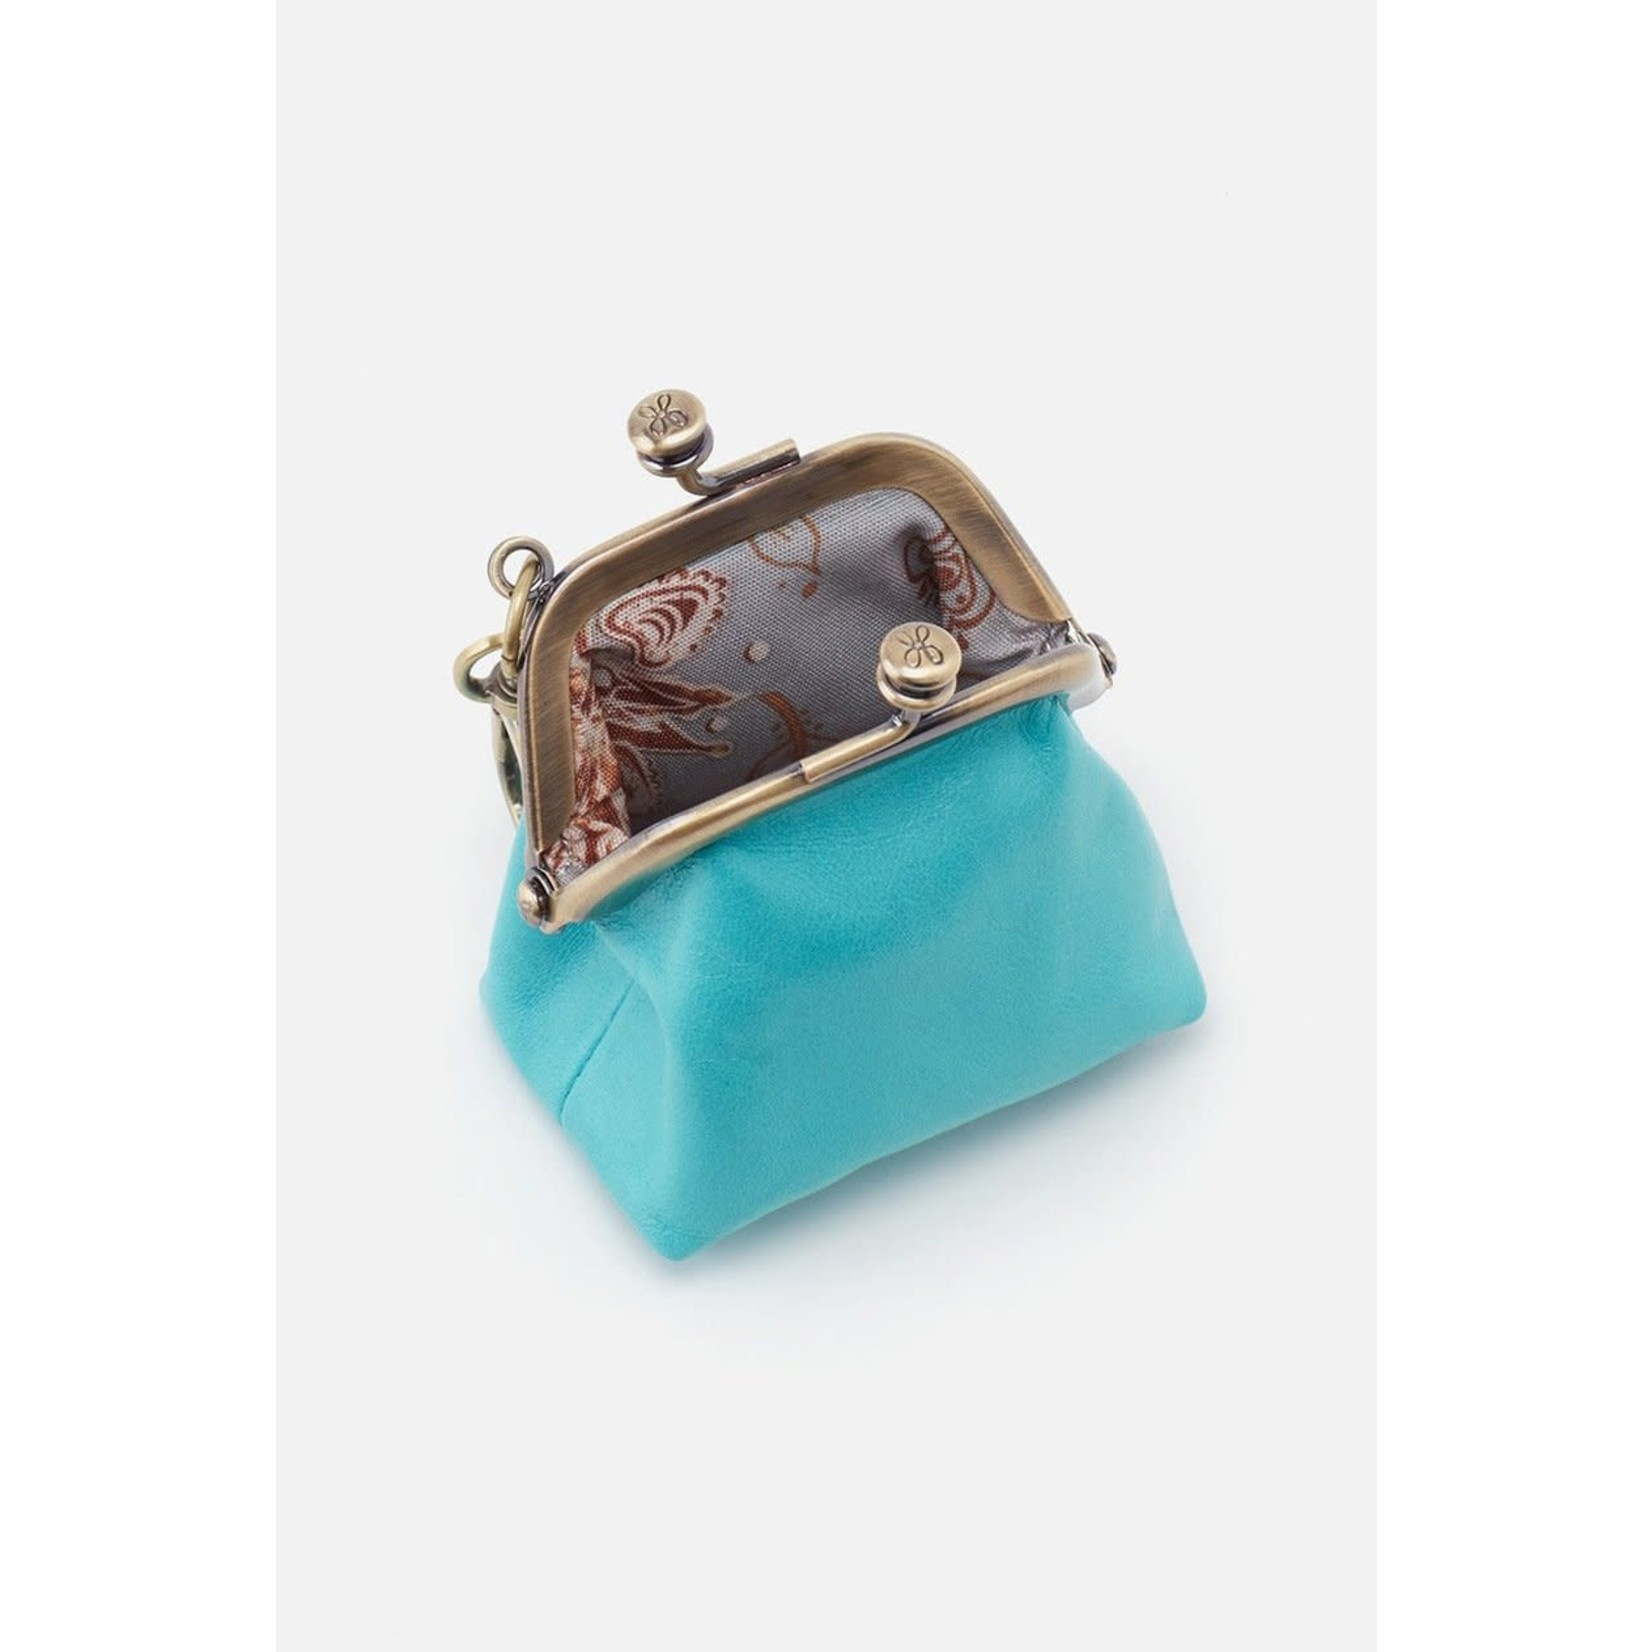 HOBO Run Aqua Vintage Leather Frame Pouch